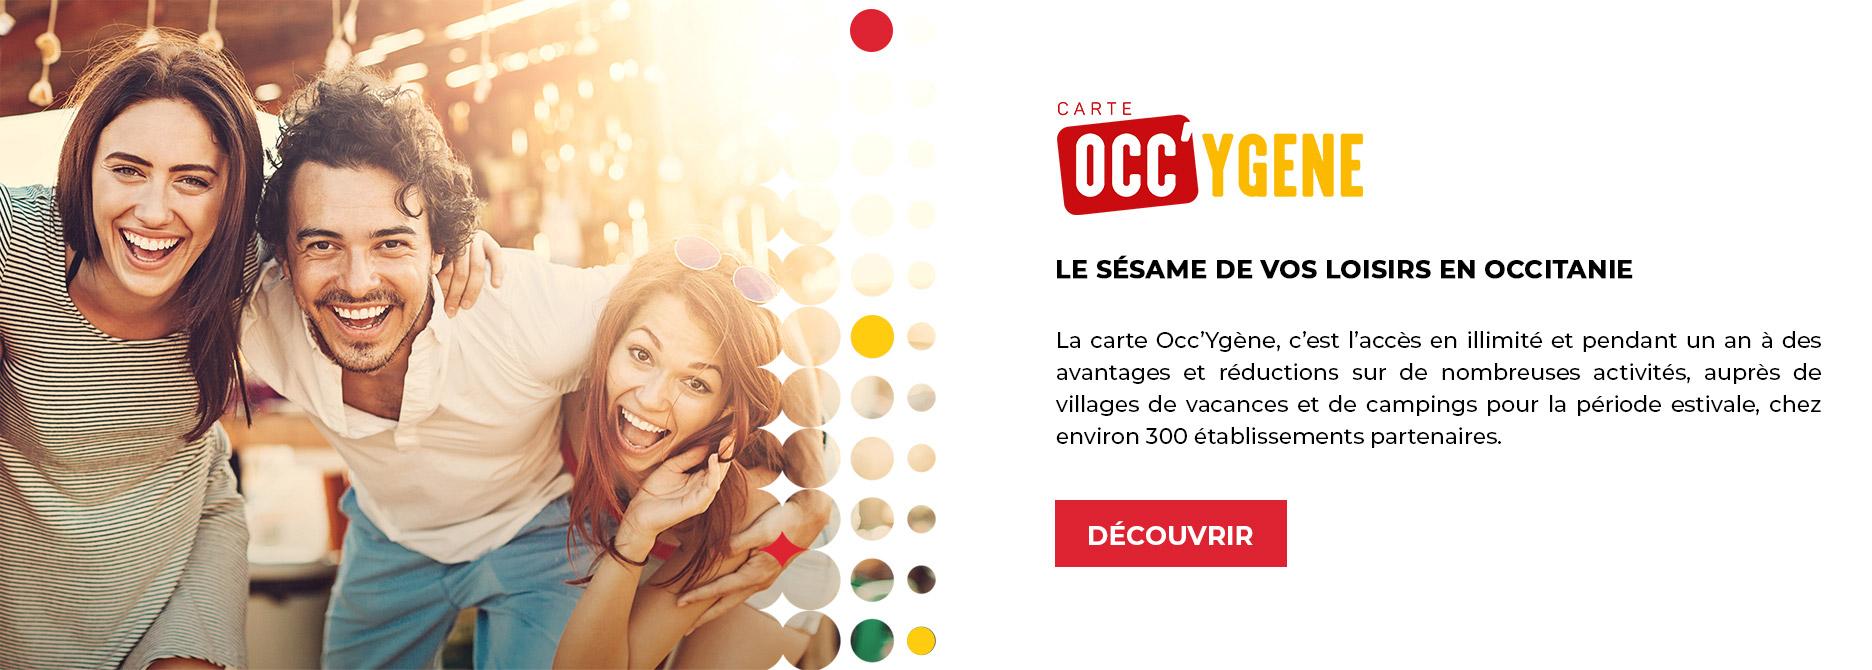 carte-occygene-banner